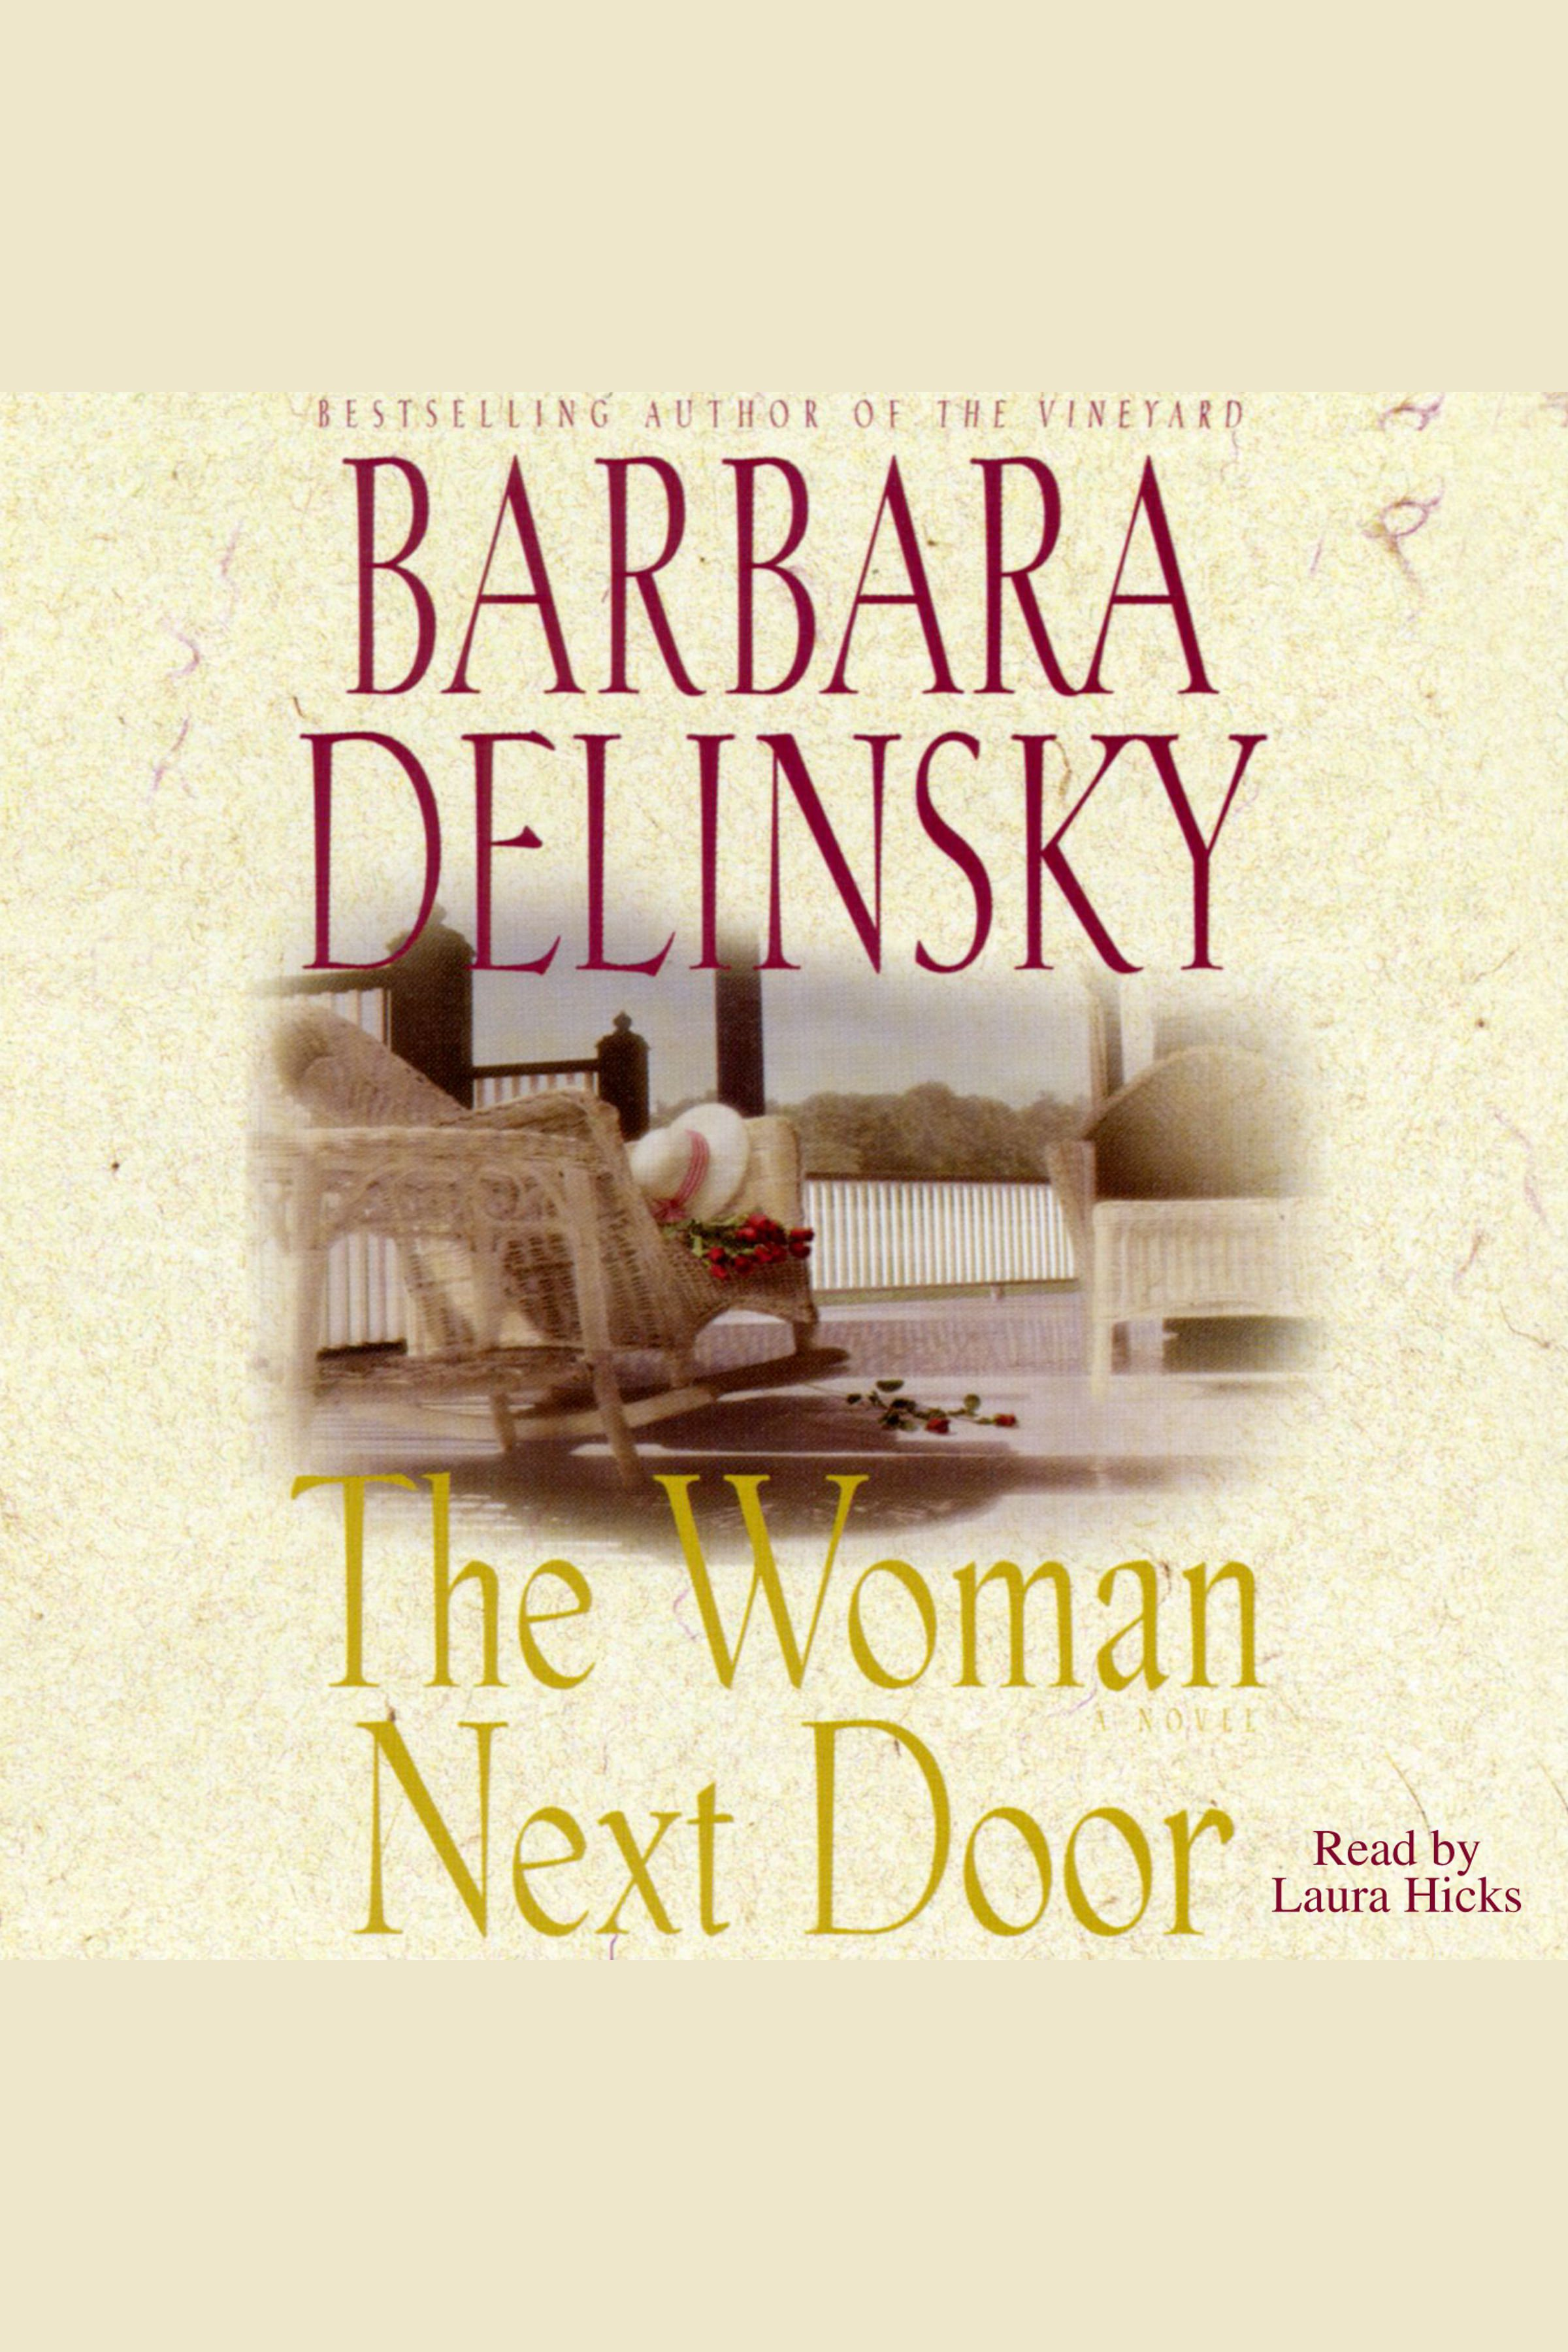 The Woman Next Door cover image